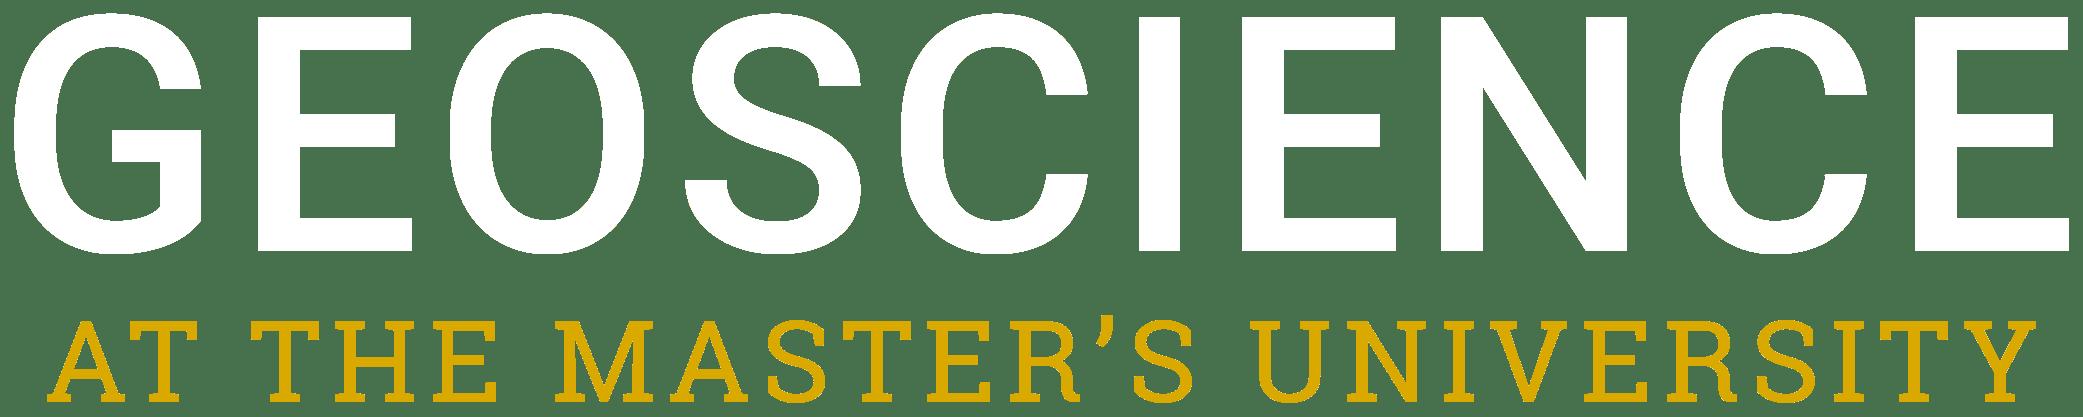 Geoscience at the Master's University